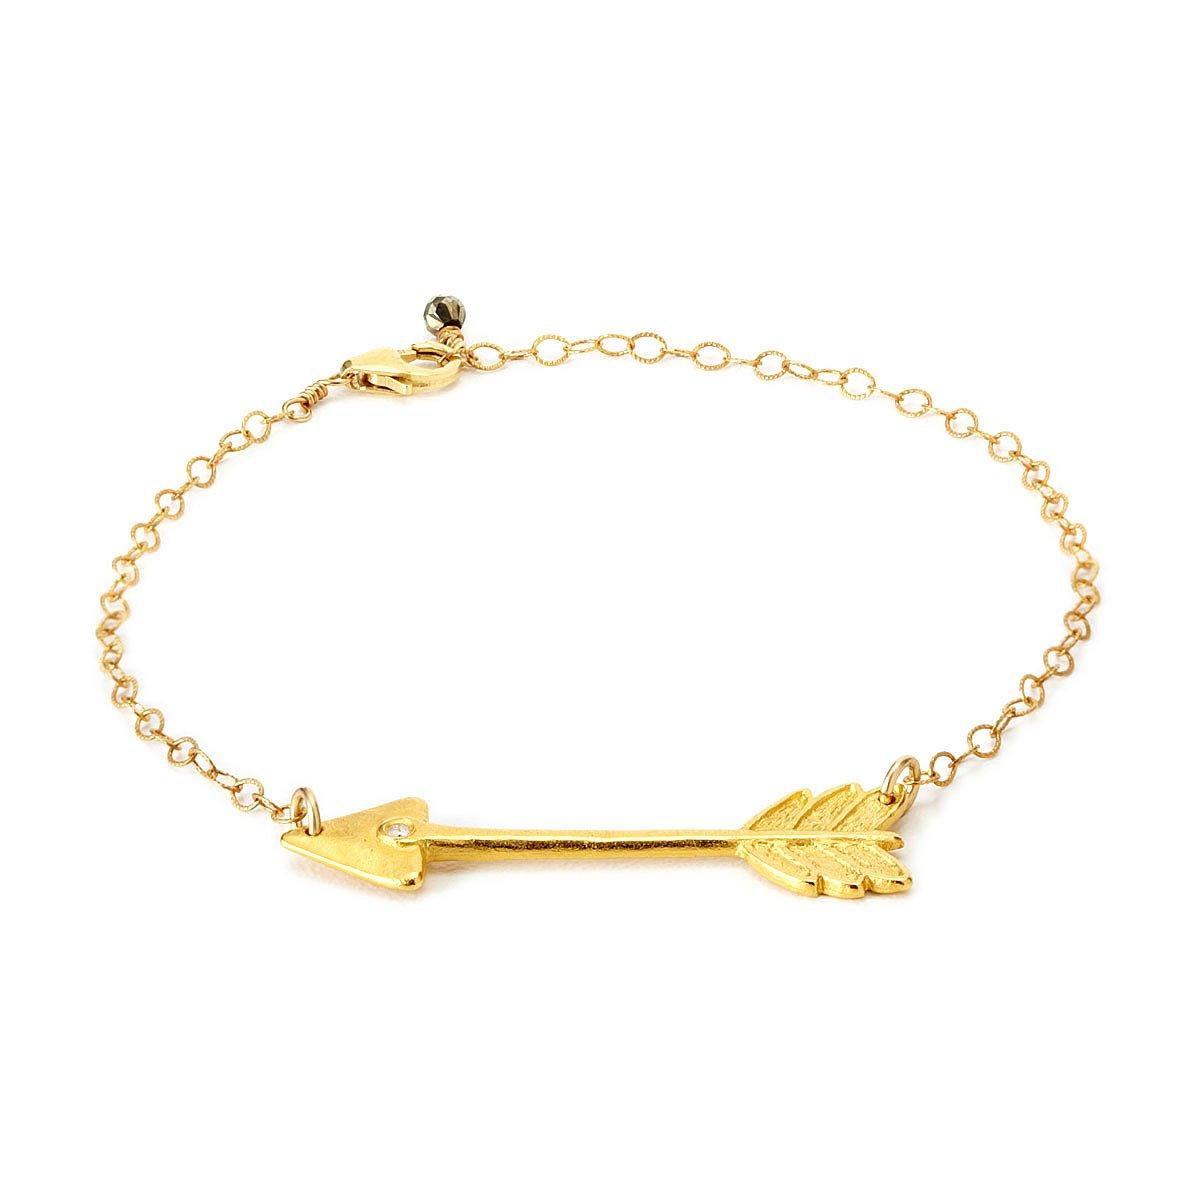 Diamond Arrow Bracelet Handmade Gold Jewelry Uncommongoods